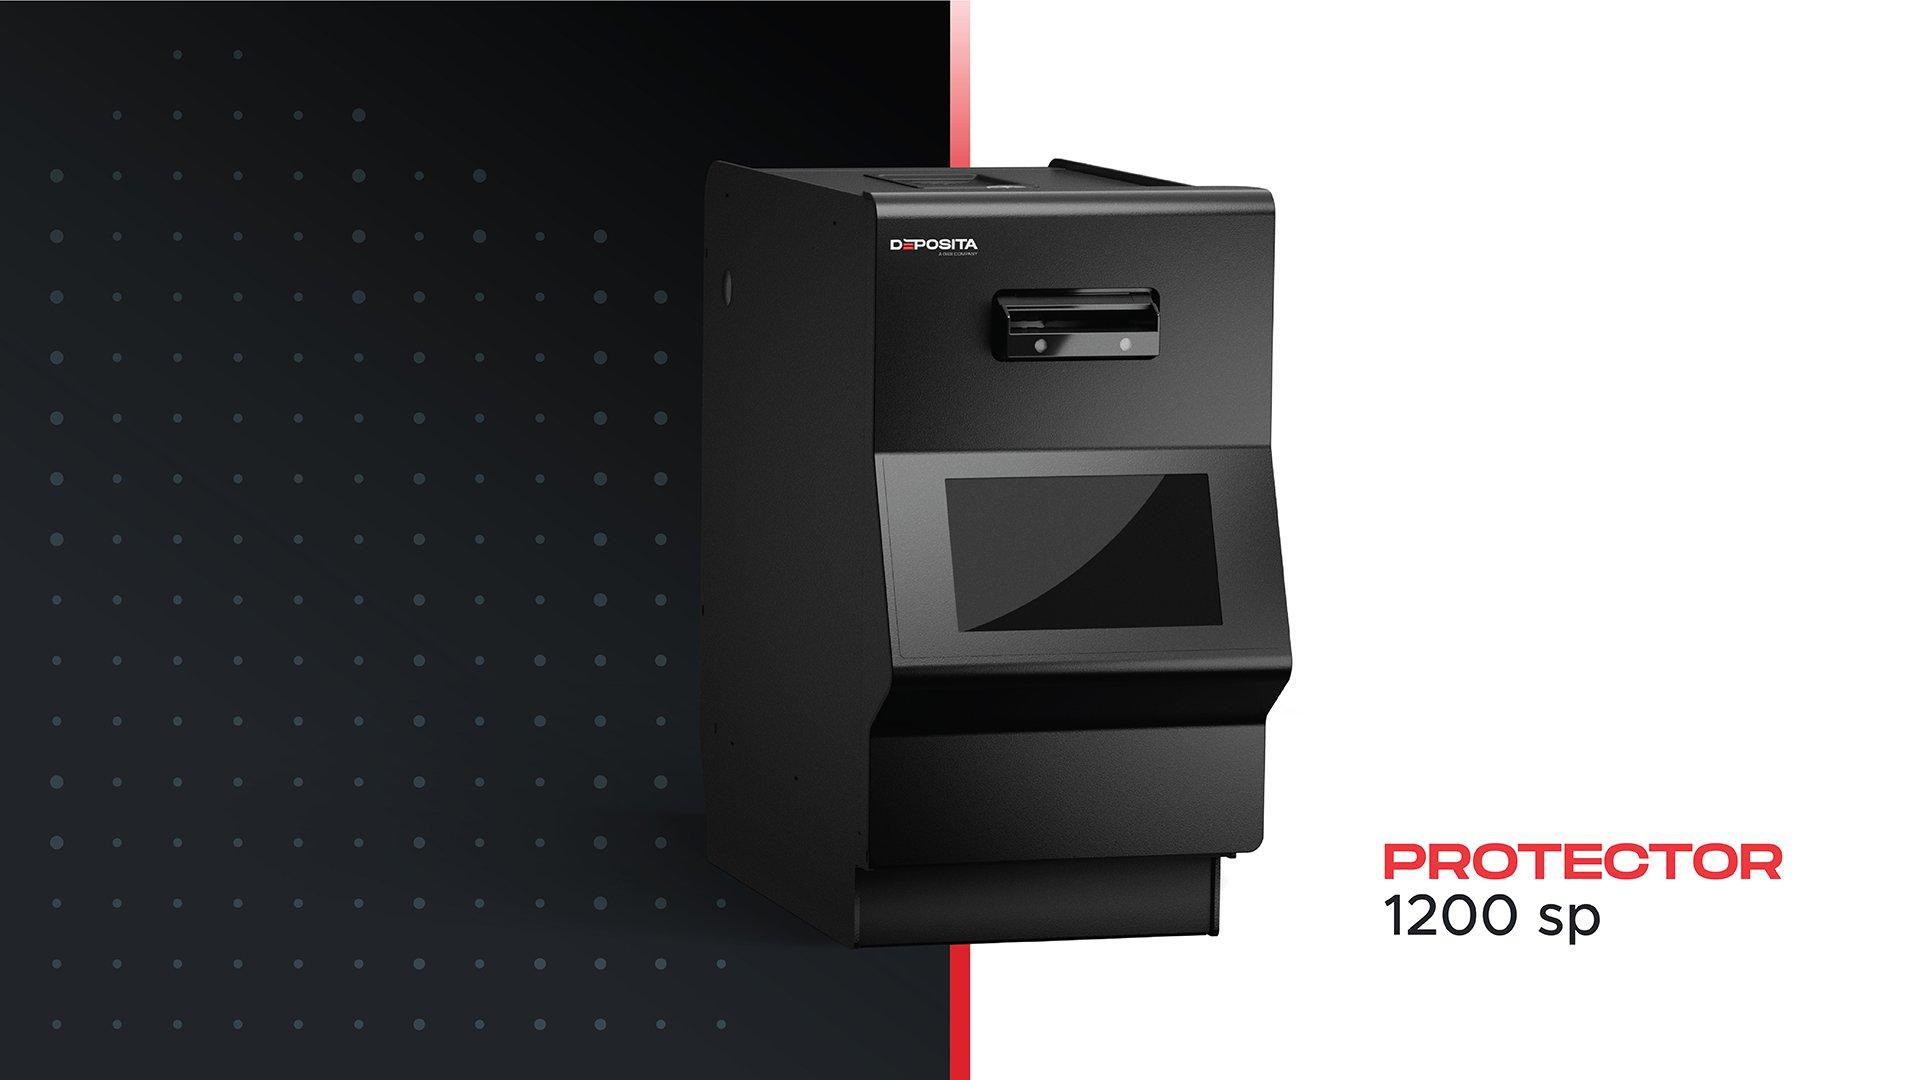 Deposita's Protector 1200 sp Smart-Safe Helps Small-Medium Businesses Thrive